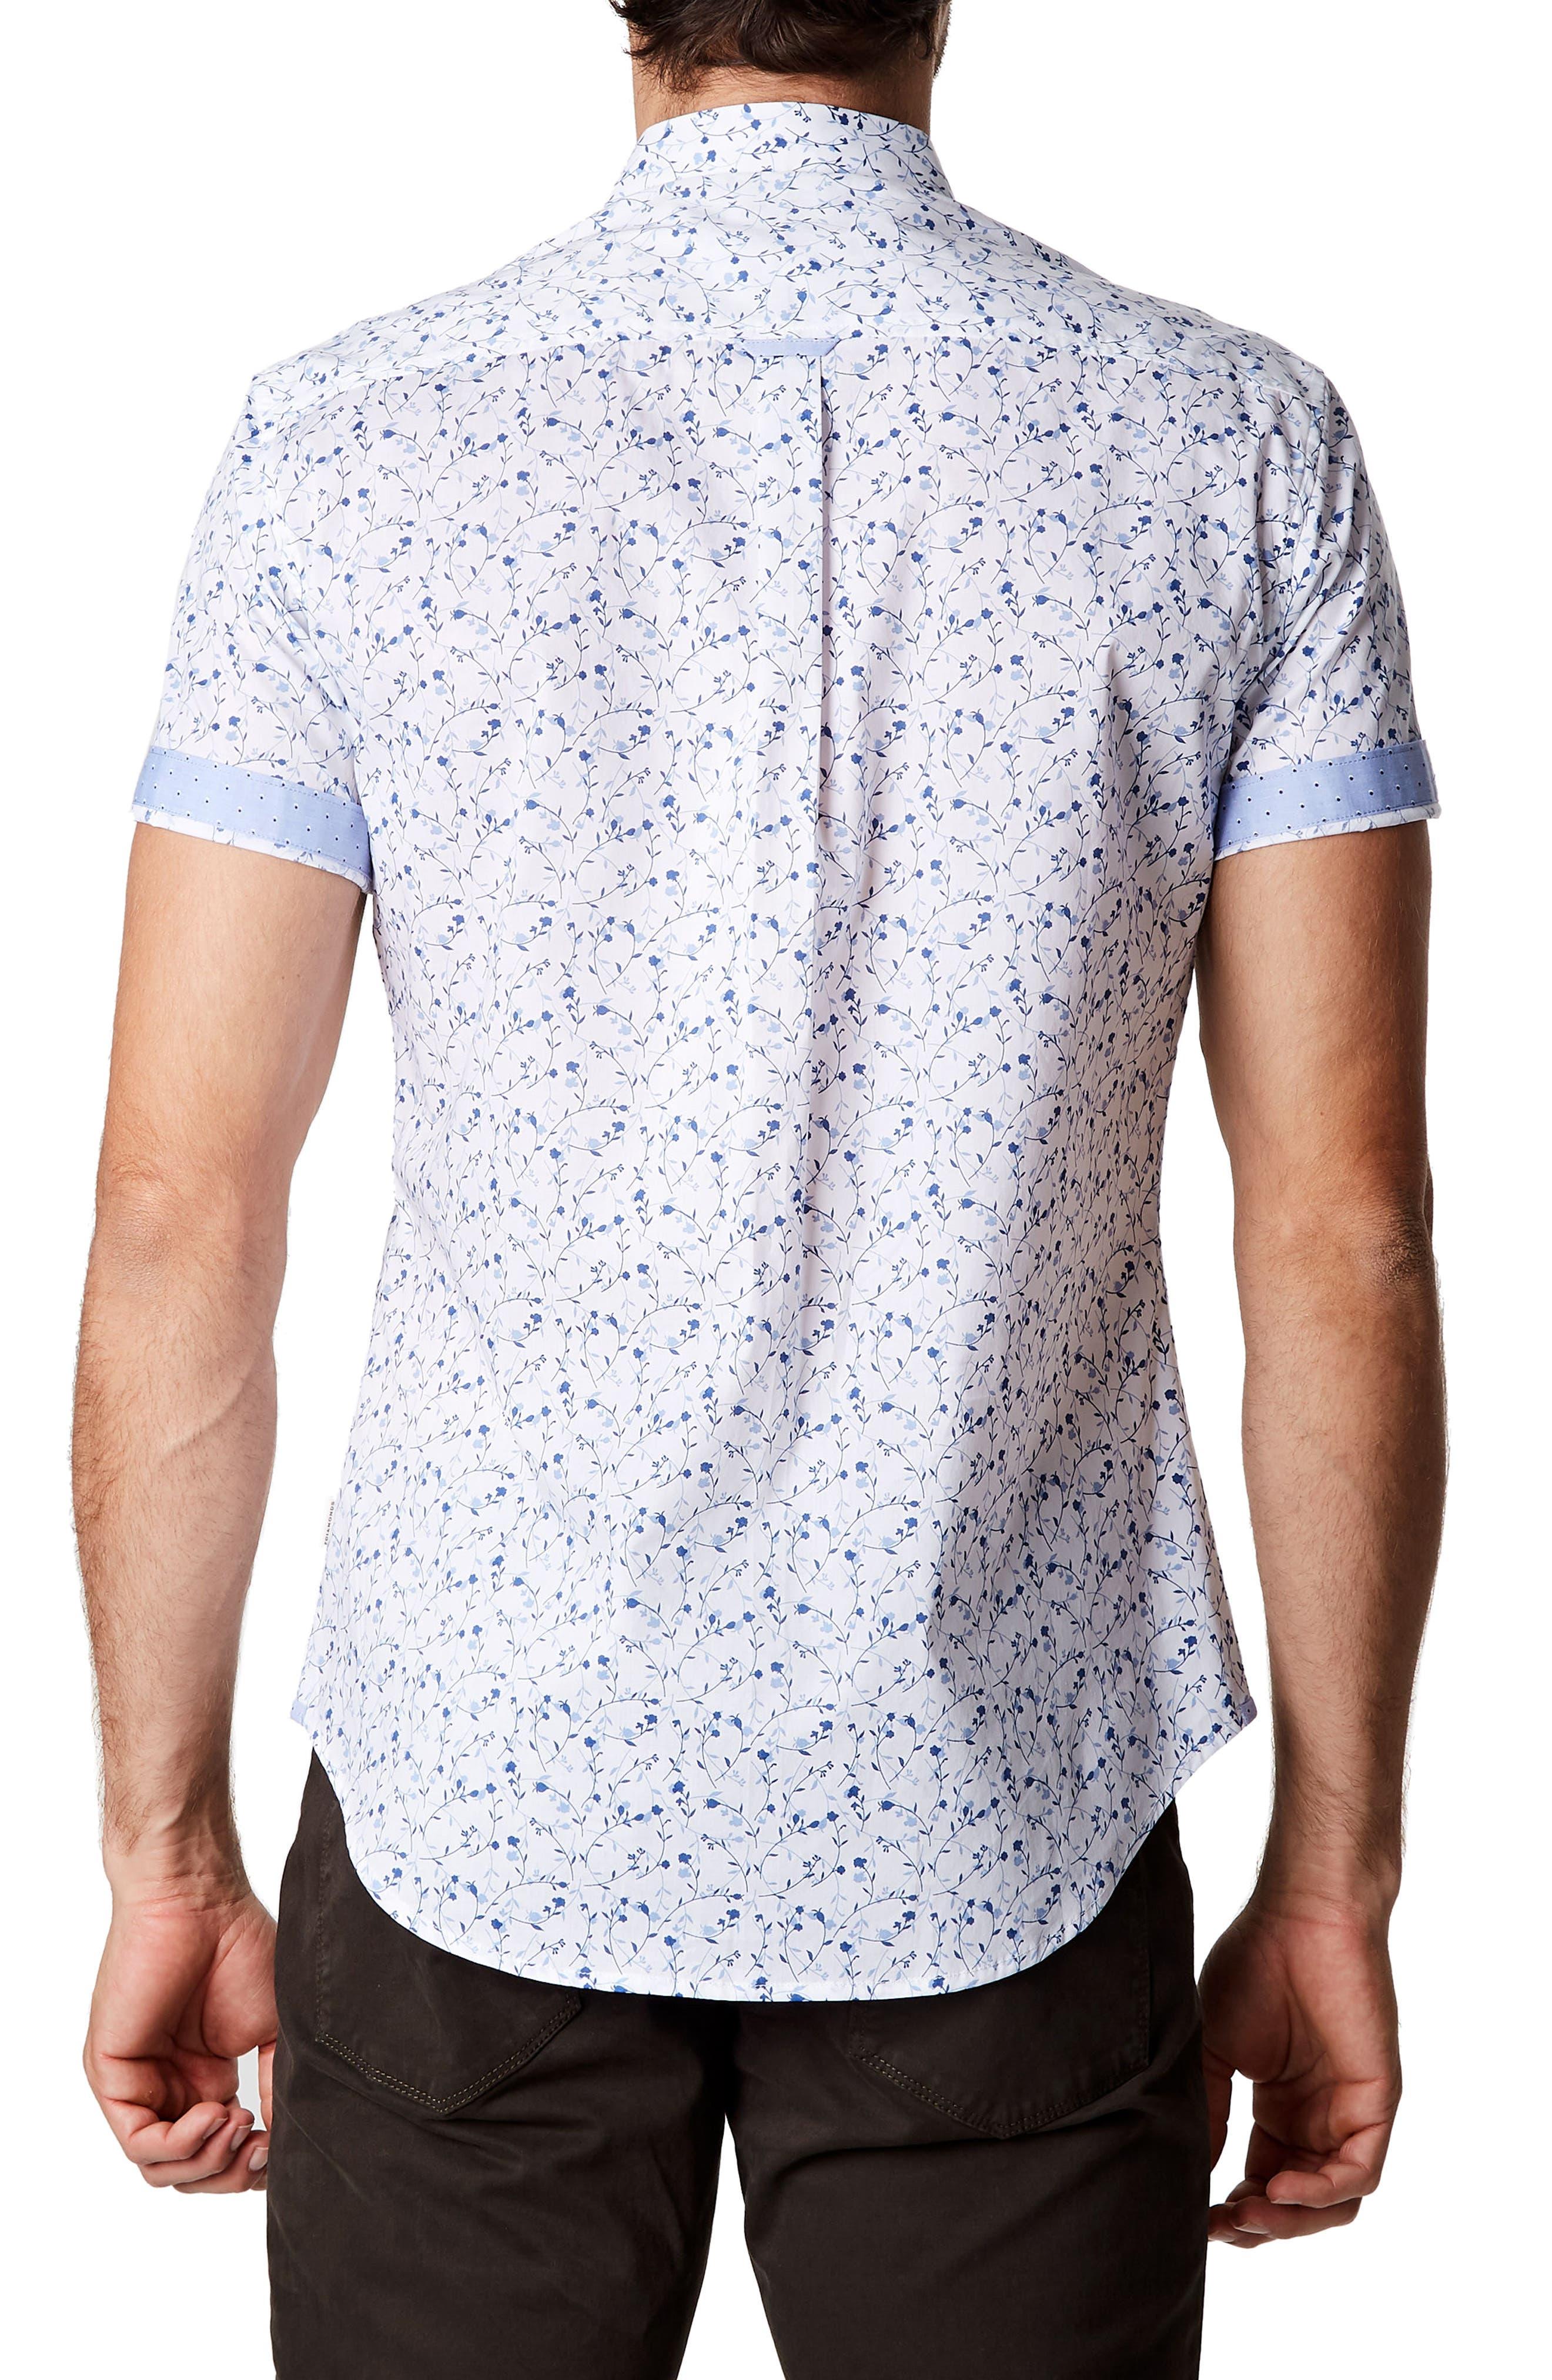 Mind Gardens Floral Sport Shirt,                             Alternate thumbnail 2, color,                             White